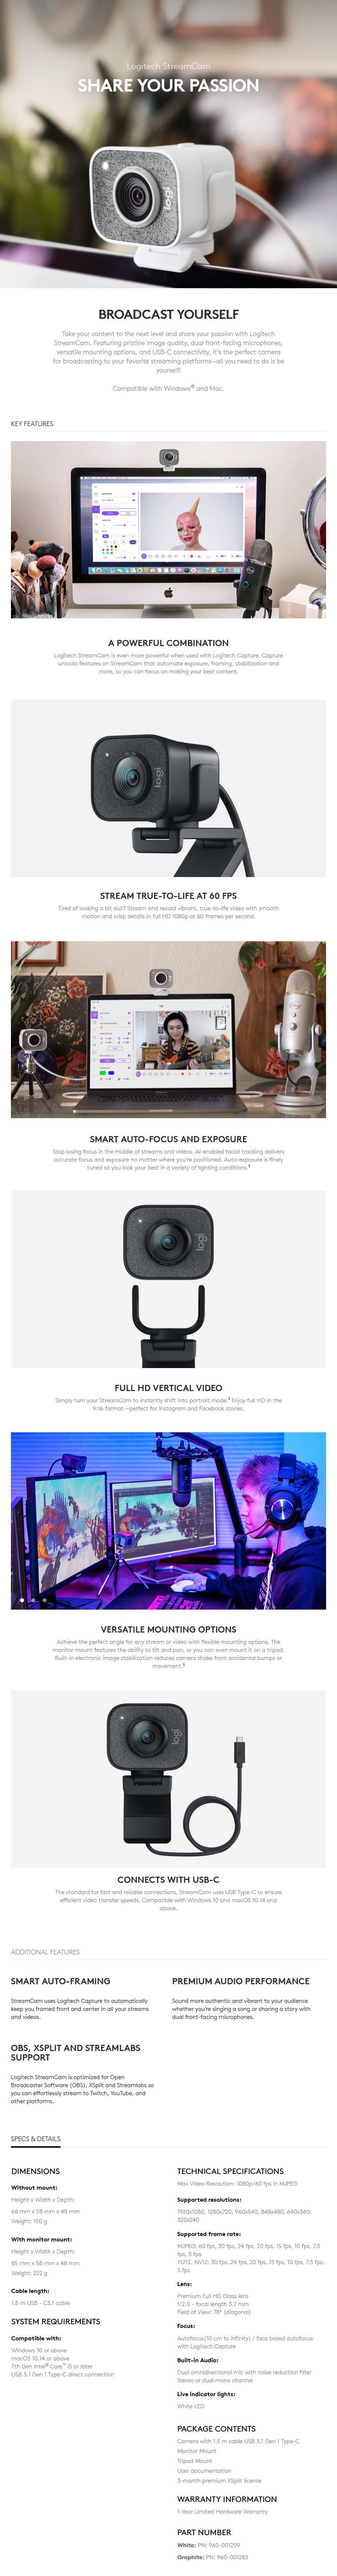 logitech-streamcam-full-hd-usbc-webcam-graphite-ac34491-6.jpg